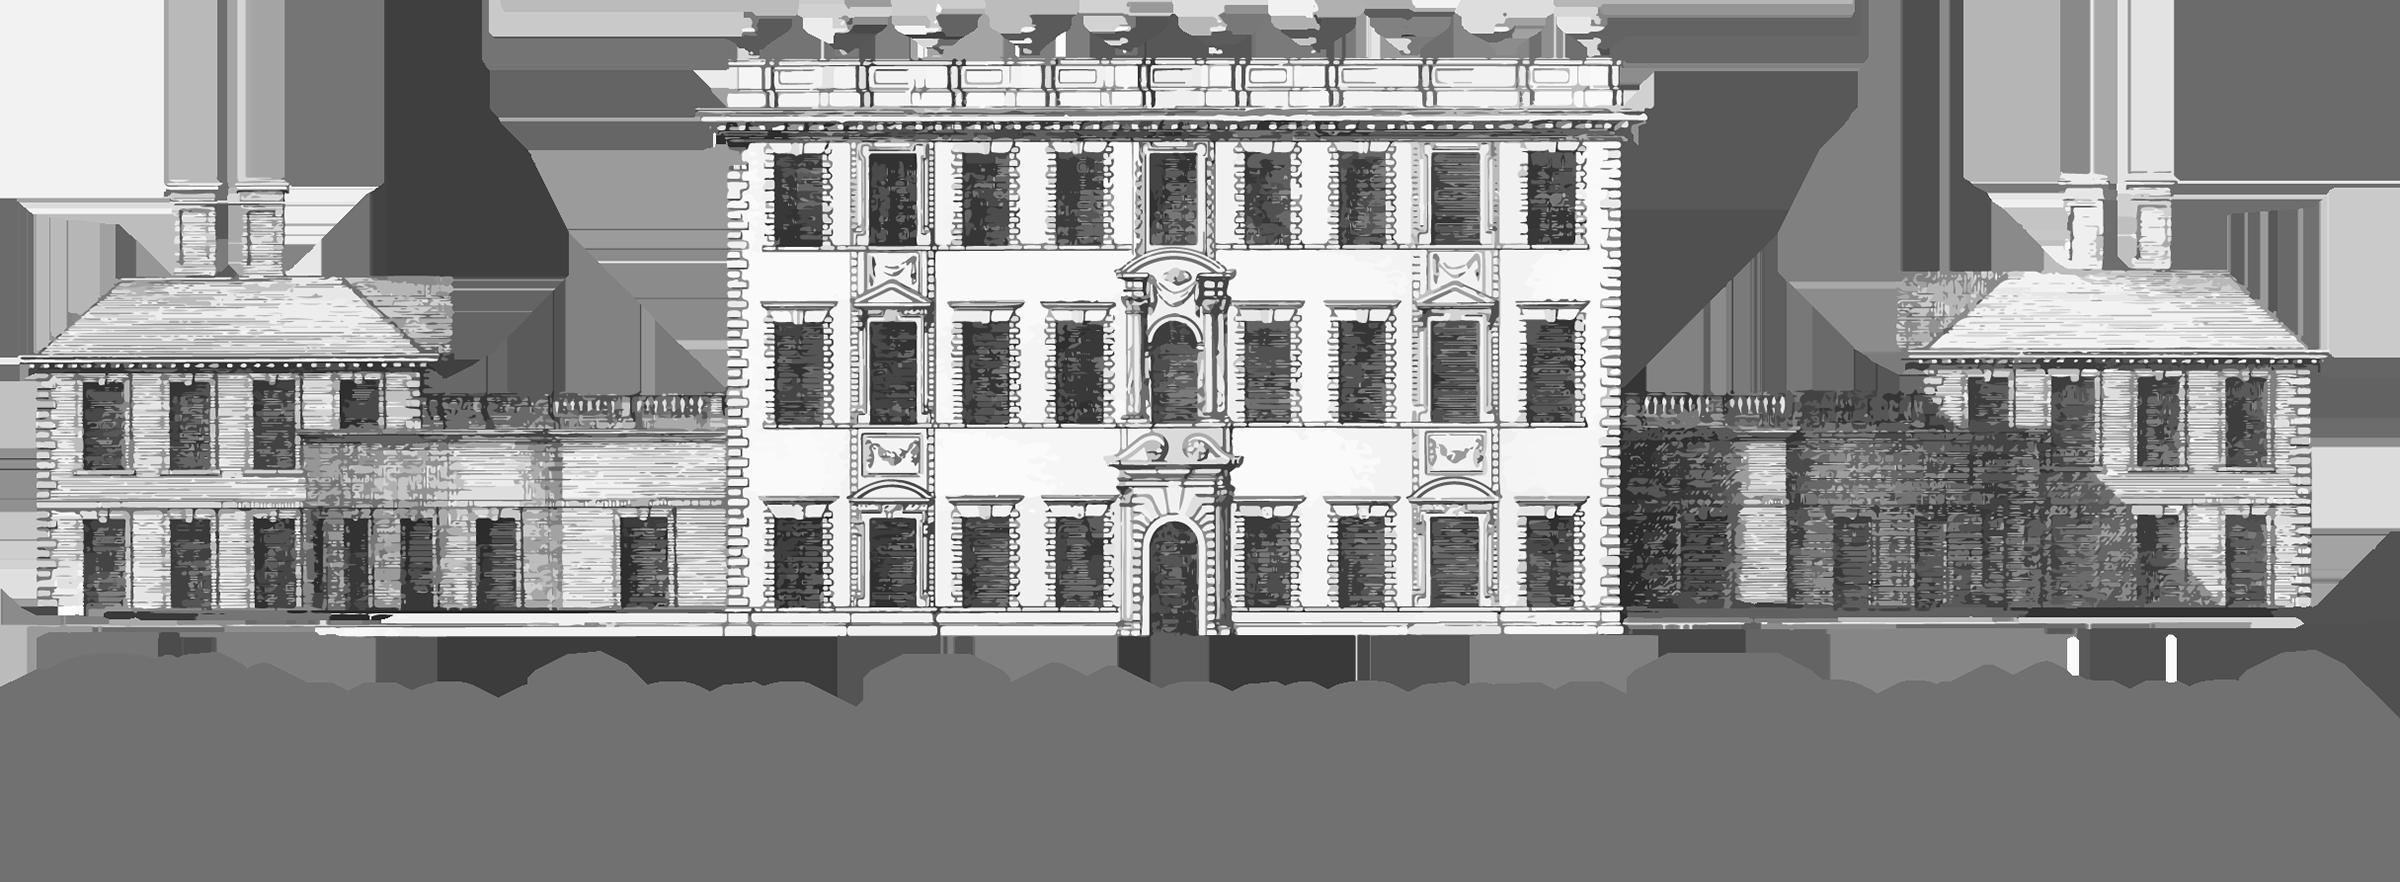 Cliveden Literary Festival